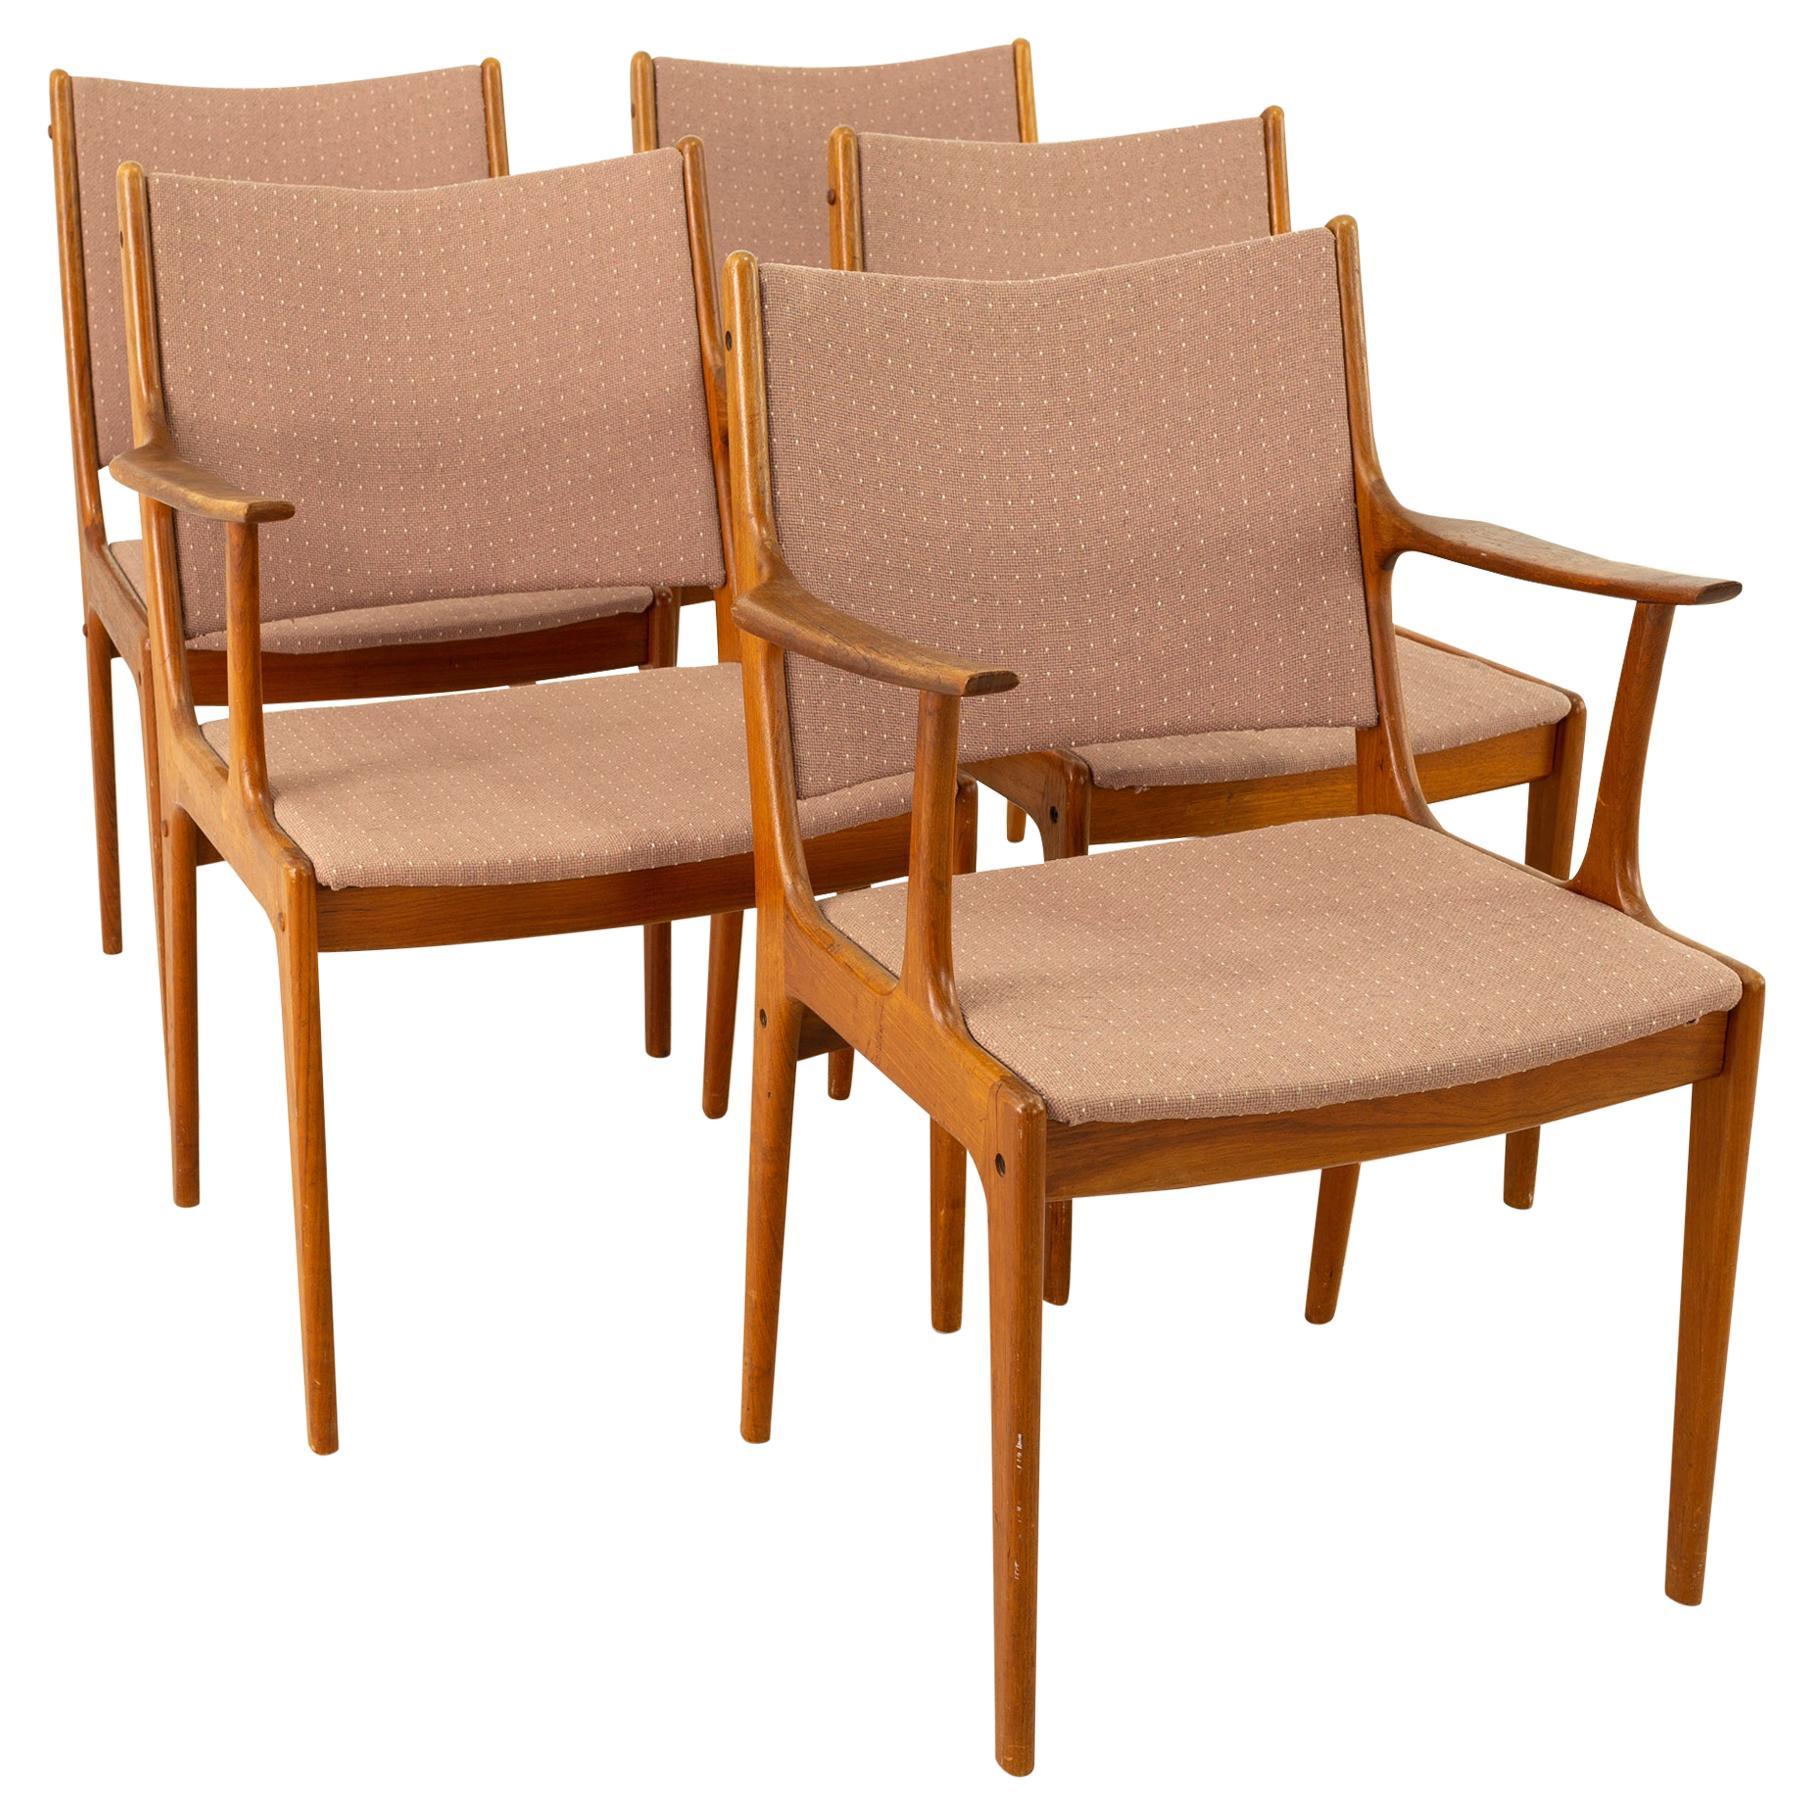 Johannes Andersen for Uldum Mobelfabrik Teak Dining Chairs, Set of 5